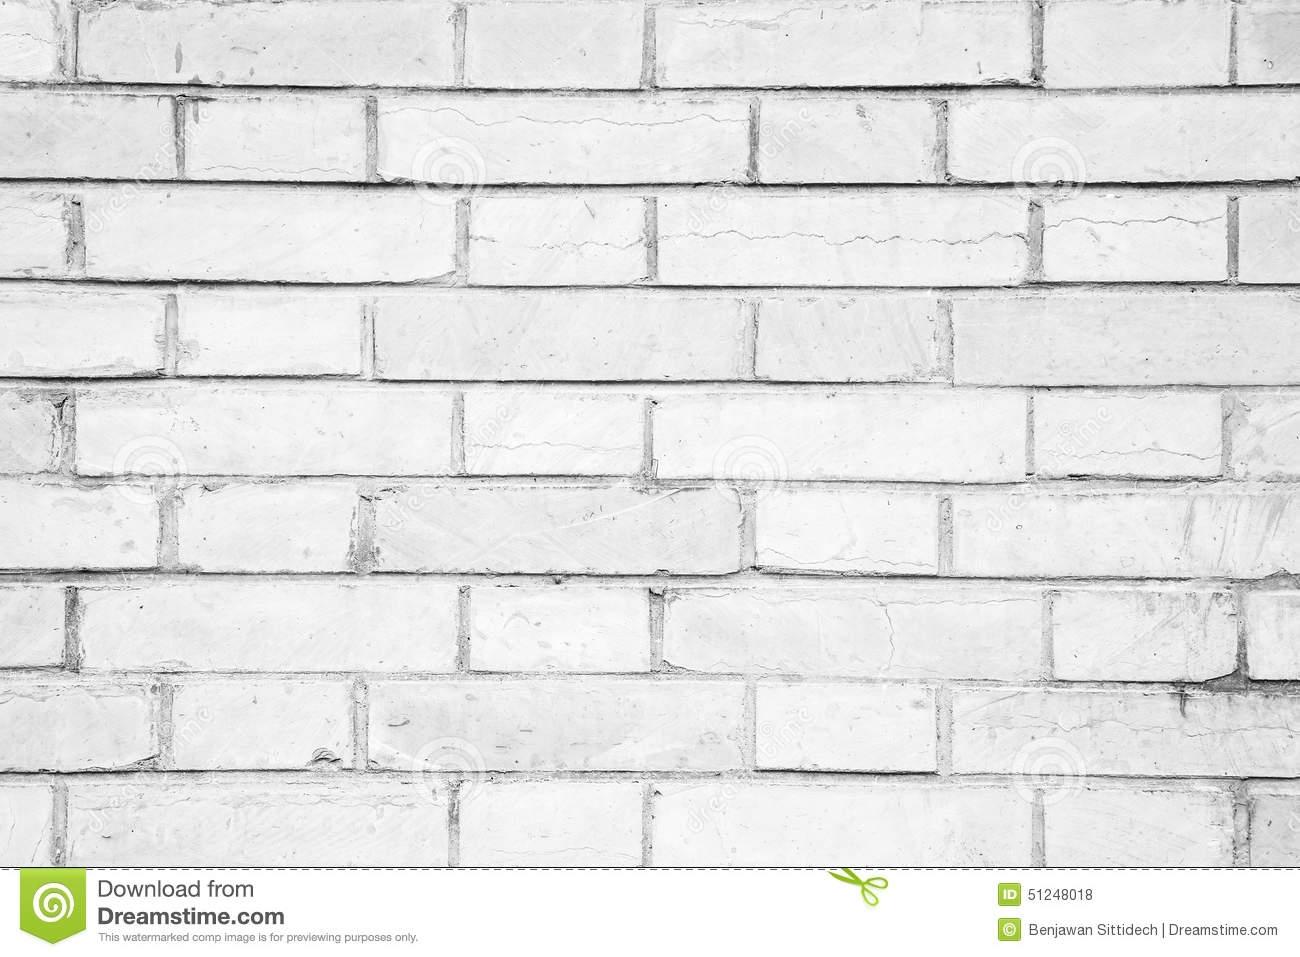 Home Design : Brick Wall Clipart Black And White Backsplash Garage.